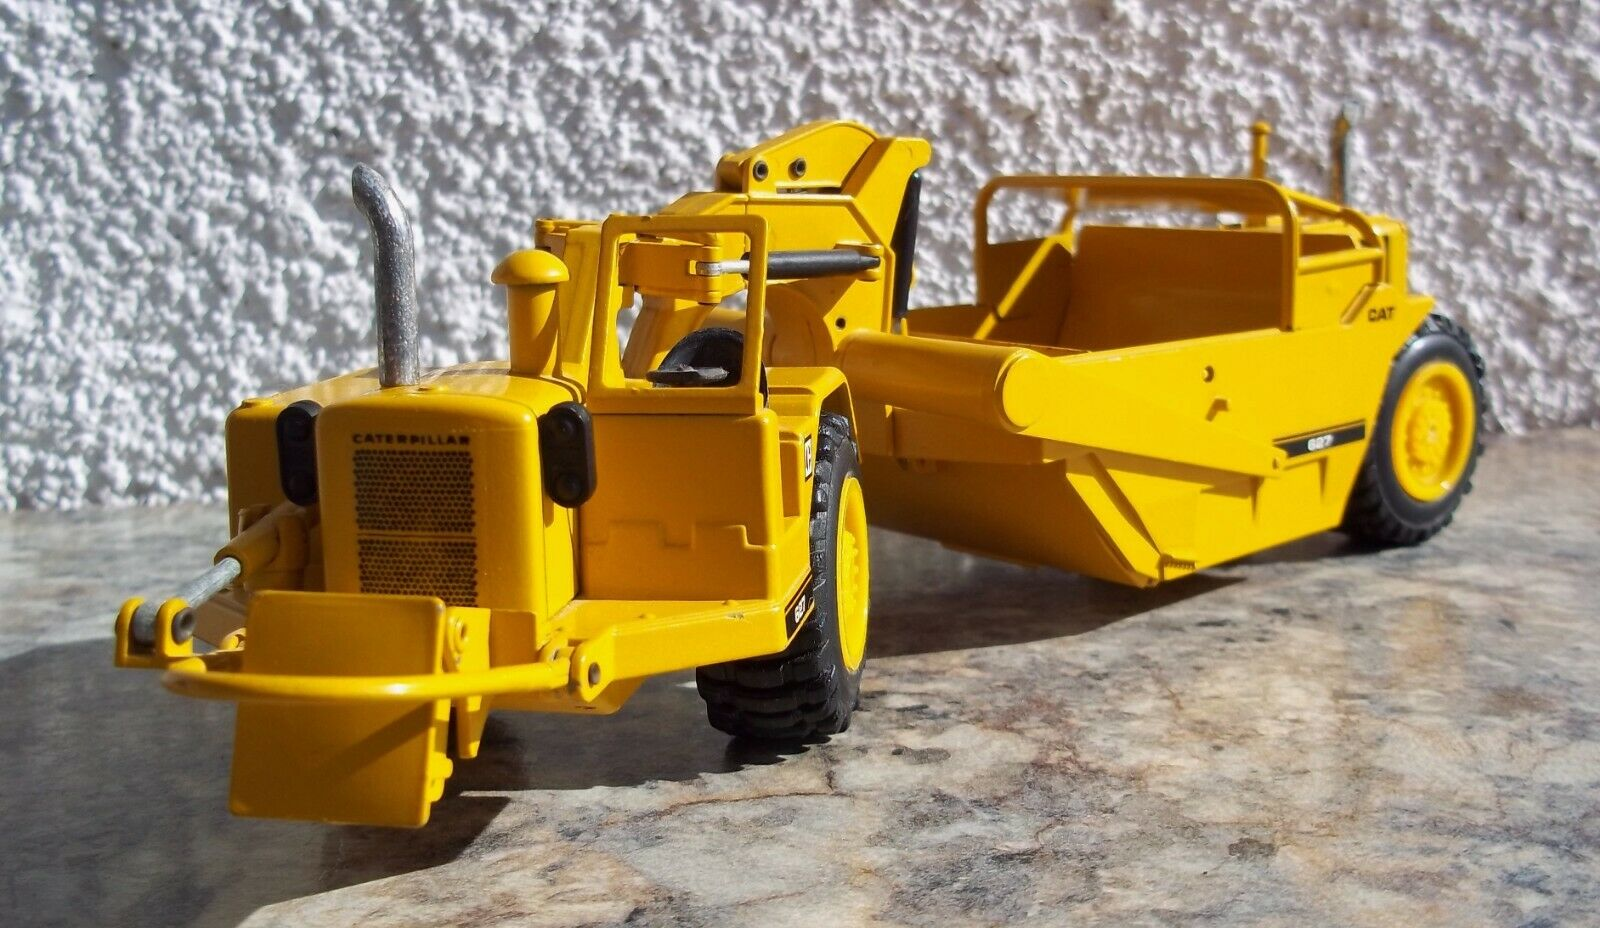 Jahr Caterpillar NZG 627 Tractor Scraper Modell West Germany 1 50 Push Pull